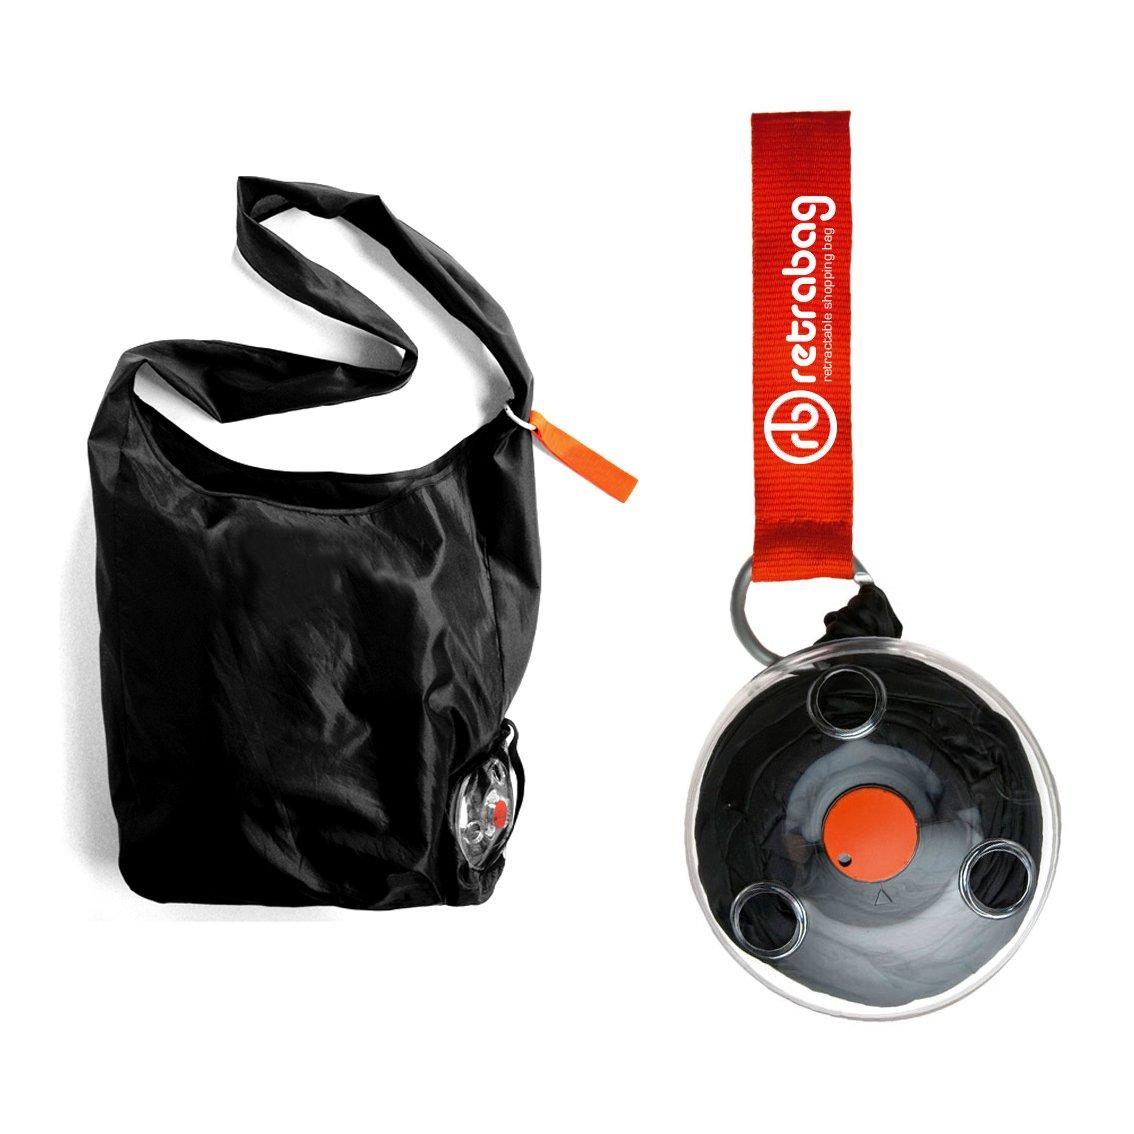 Retrabag Retractable Reusable Grocery Shopping Eco-friendly Tote Bag with Carabiner by Retrabag B016NX0OB2